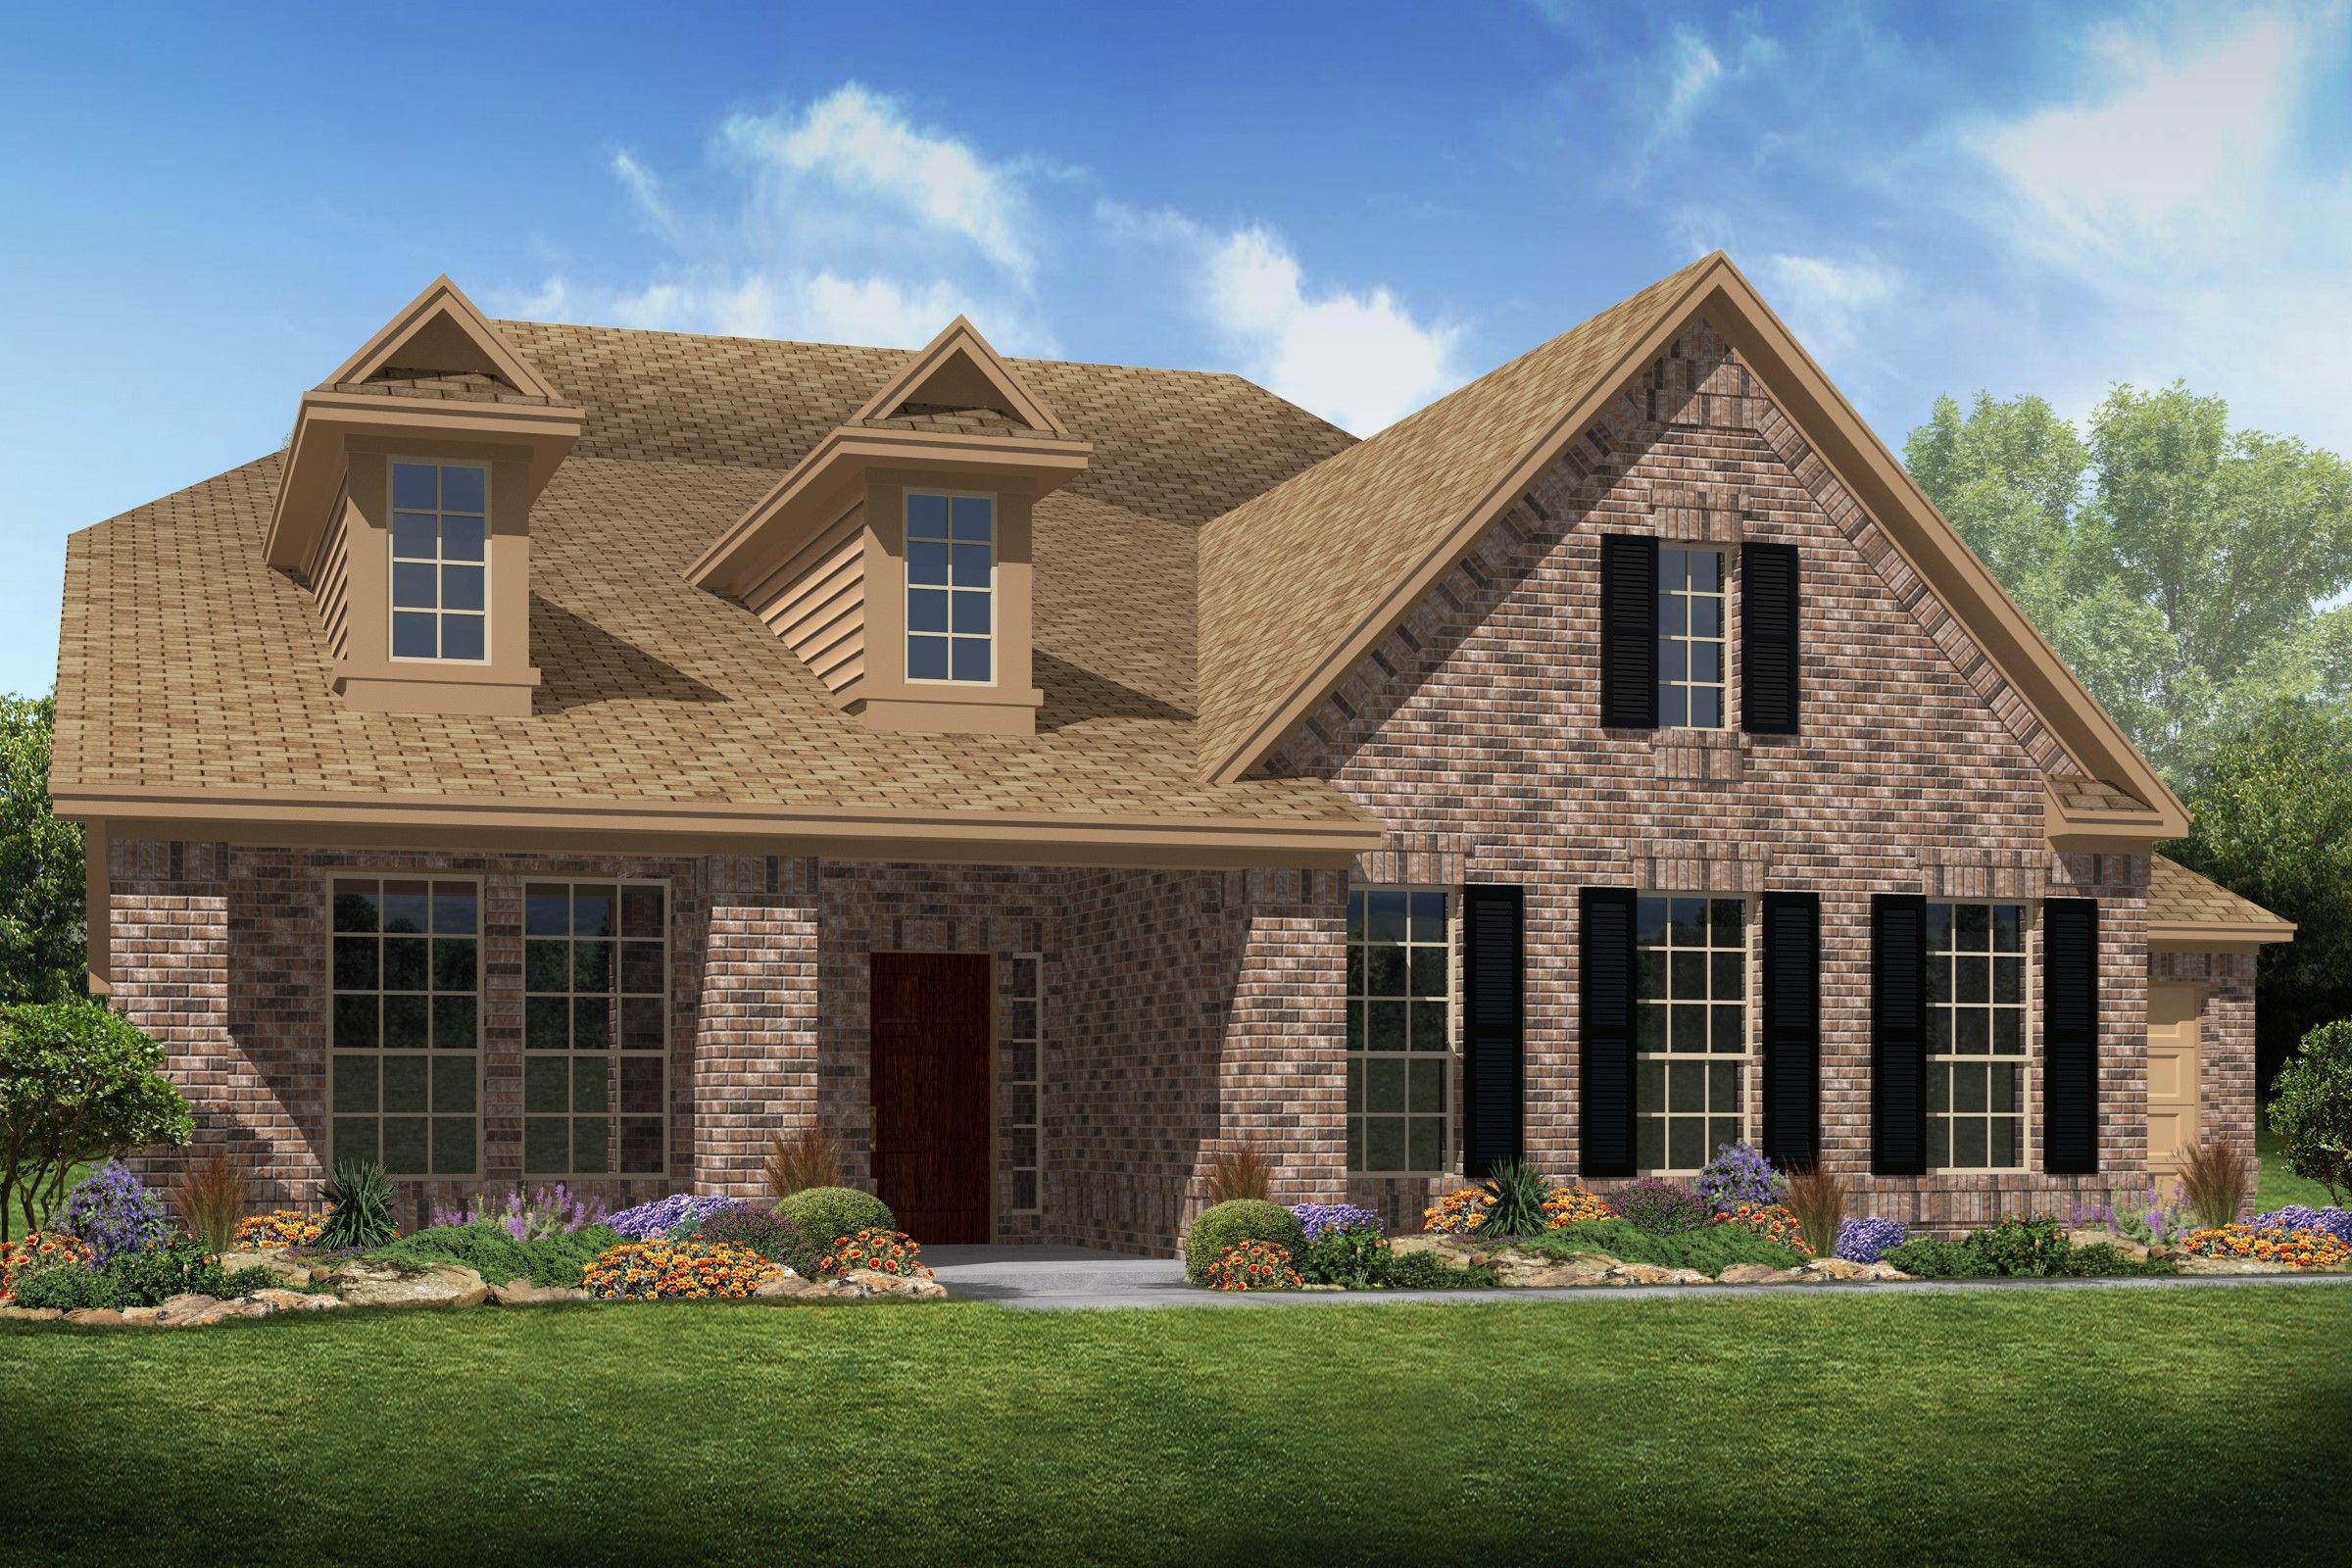 Single Family for Sale at Tejas Lakes - Lori 7802 Tejas Lakes Trail Needville, Texas 77461 United States